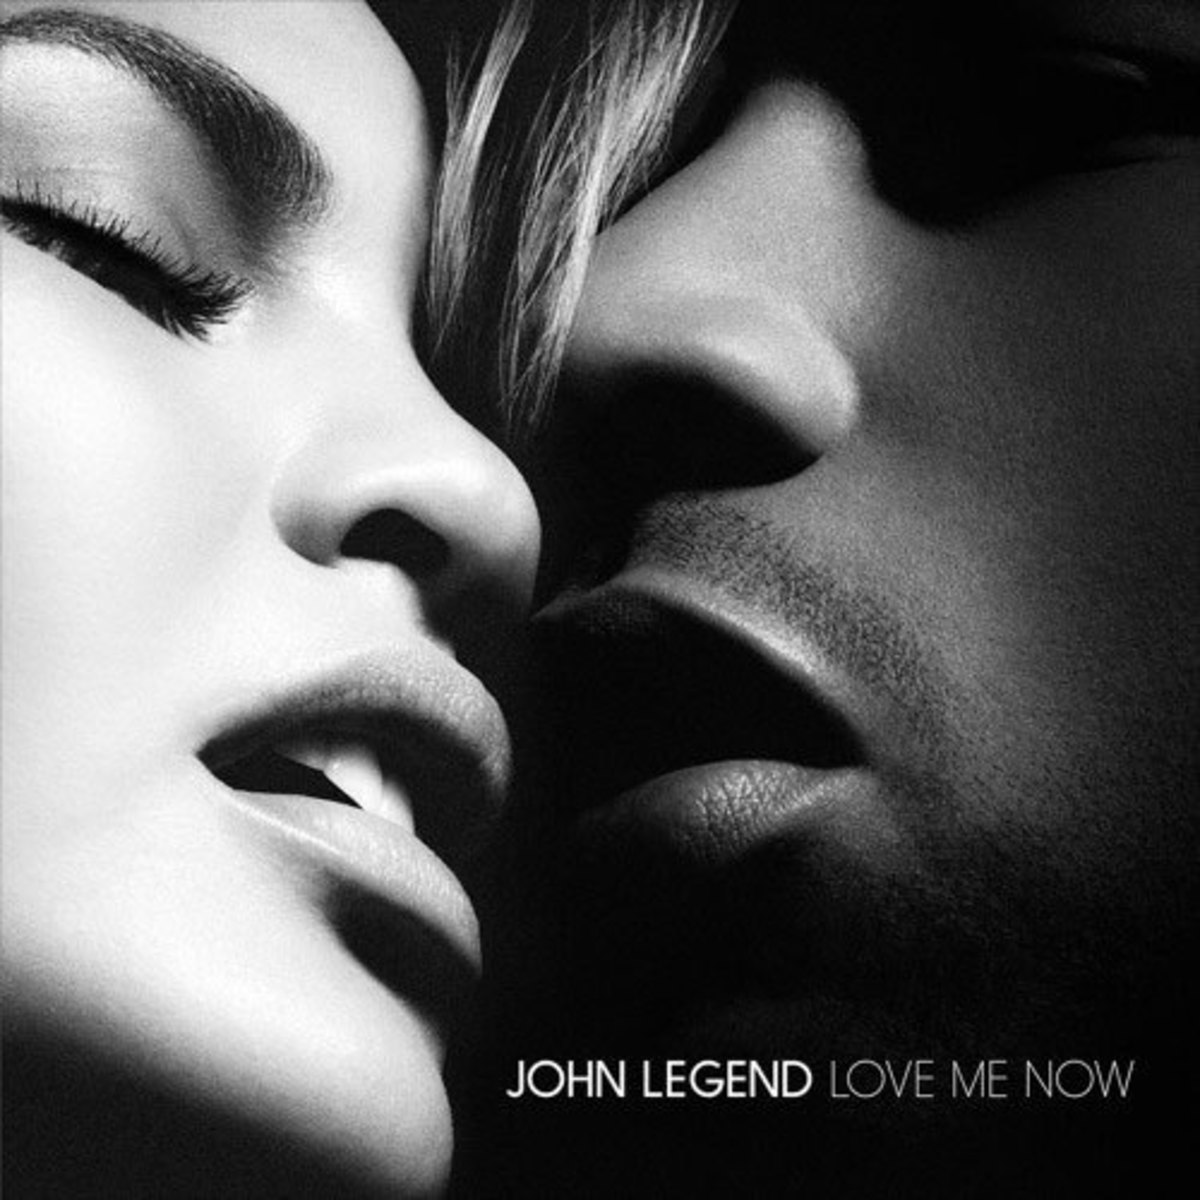 john-legend-love-me-now.jpg